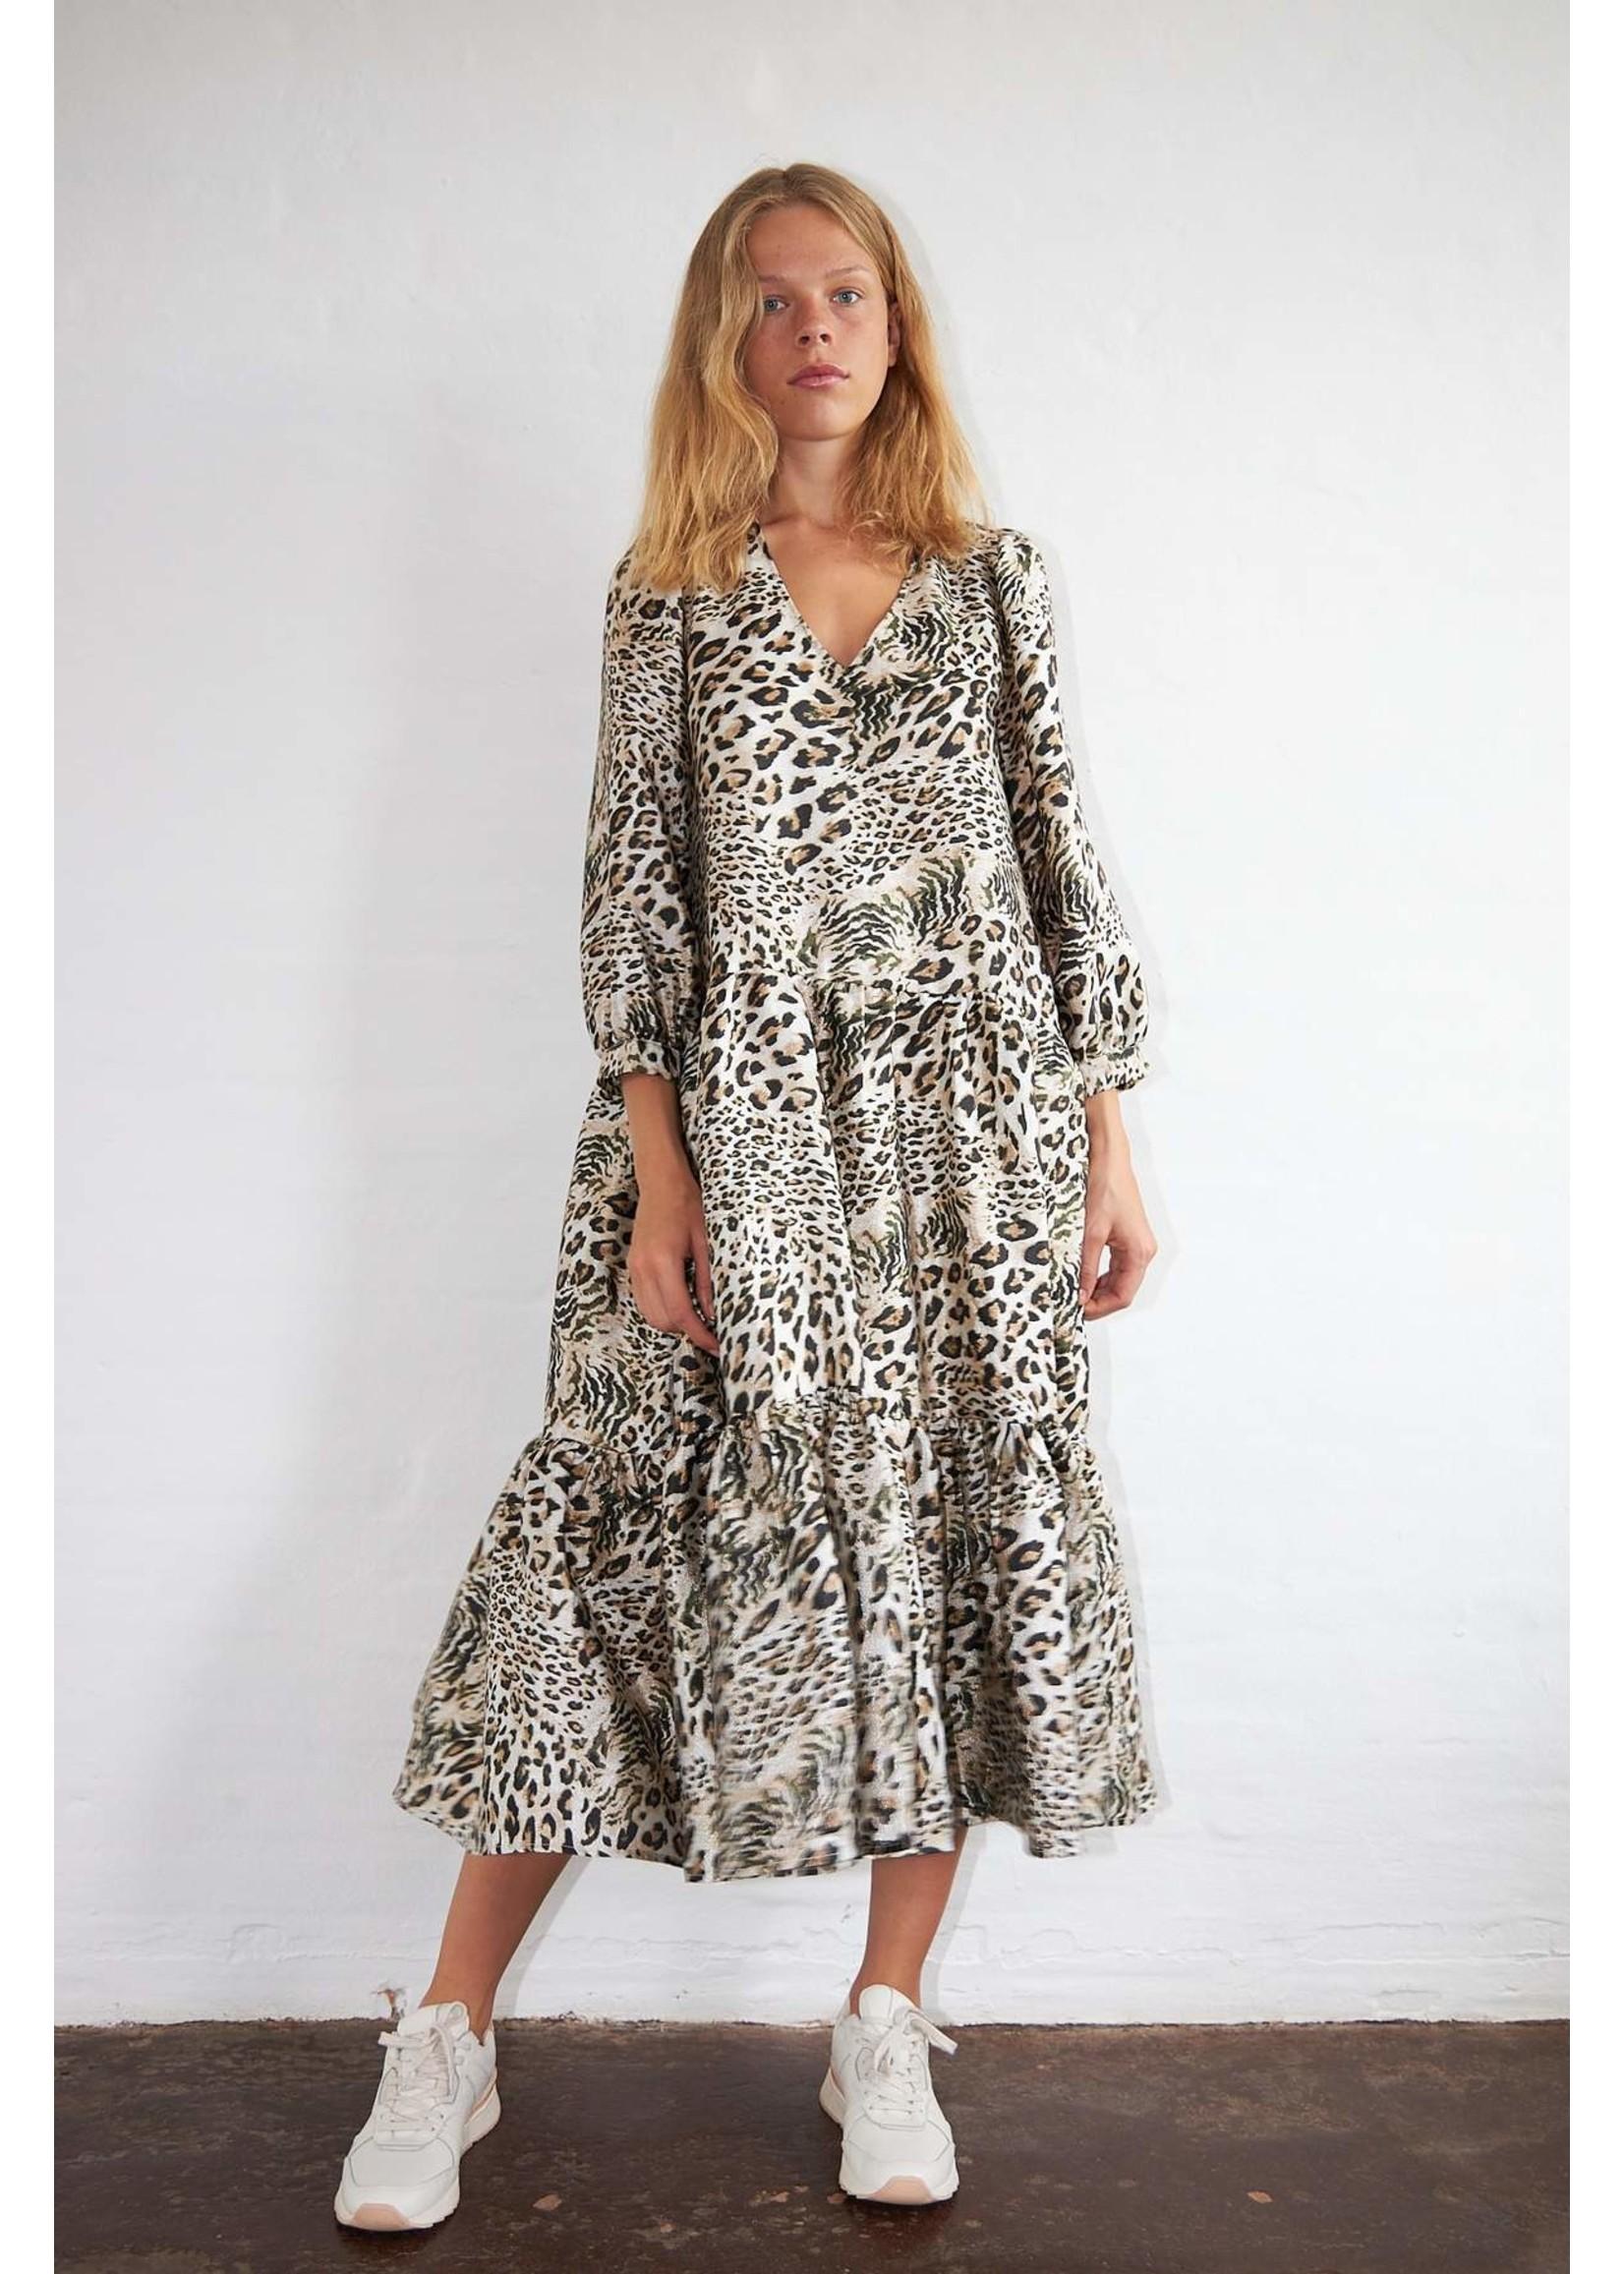 LEOPARD MIX DRESS